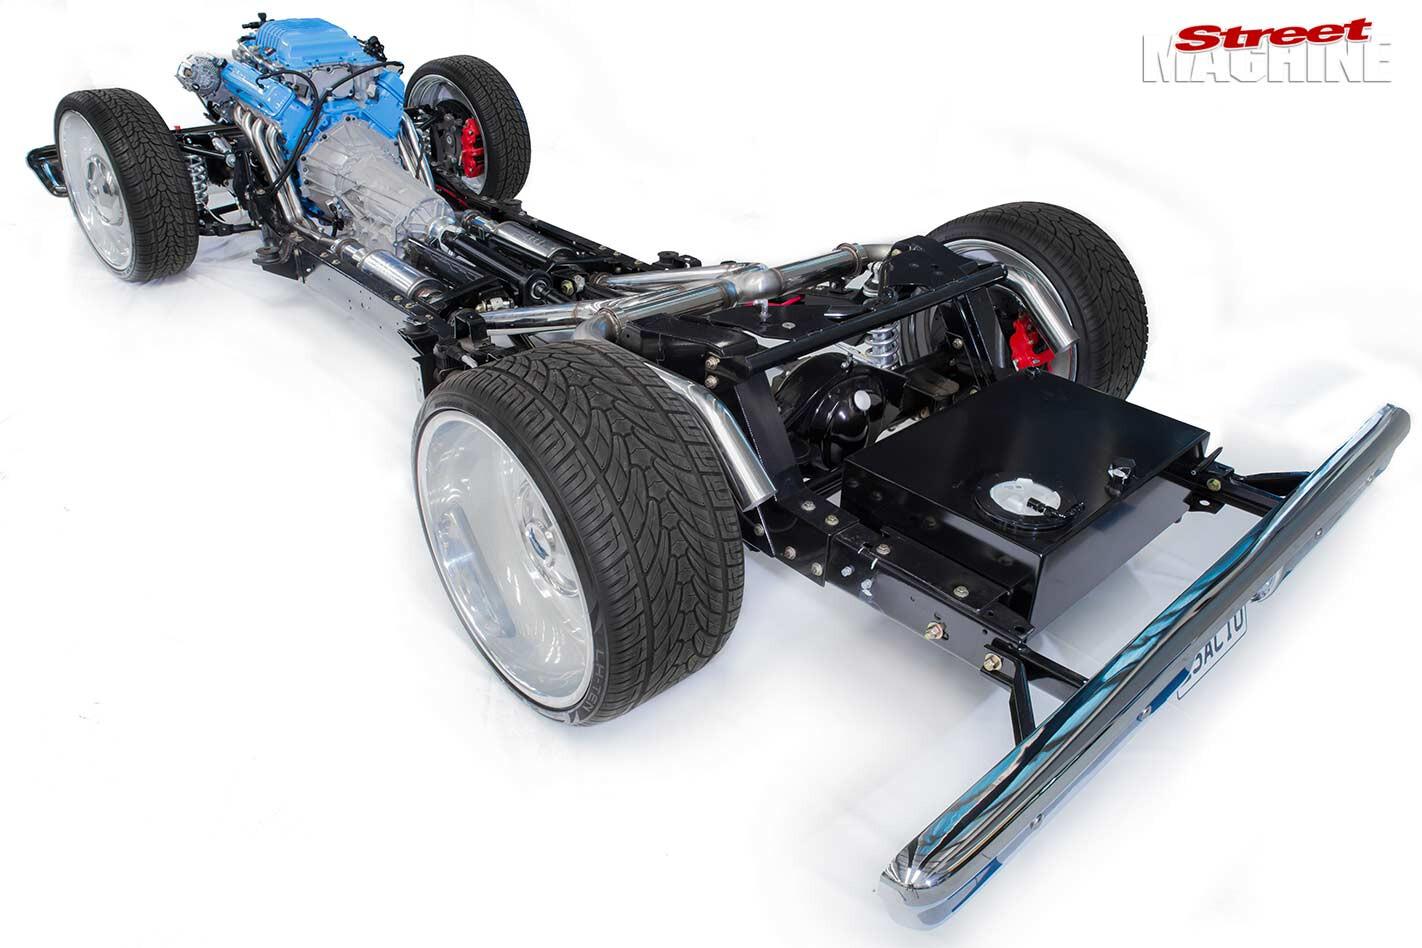 Chev C10 build